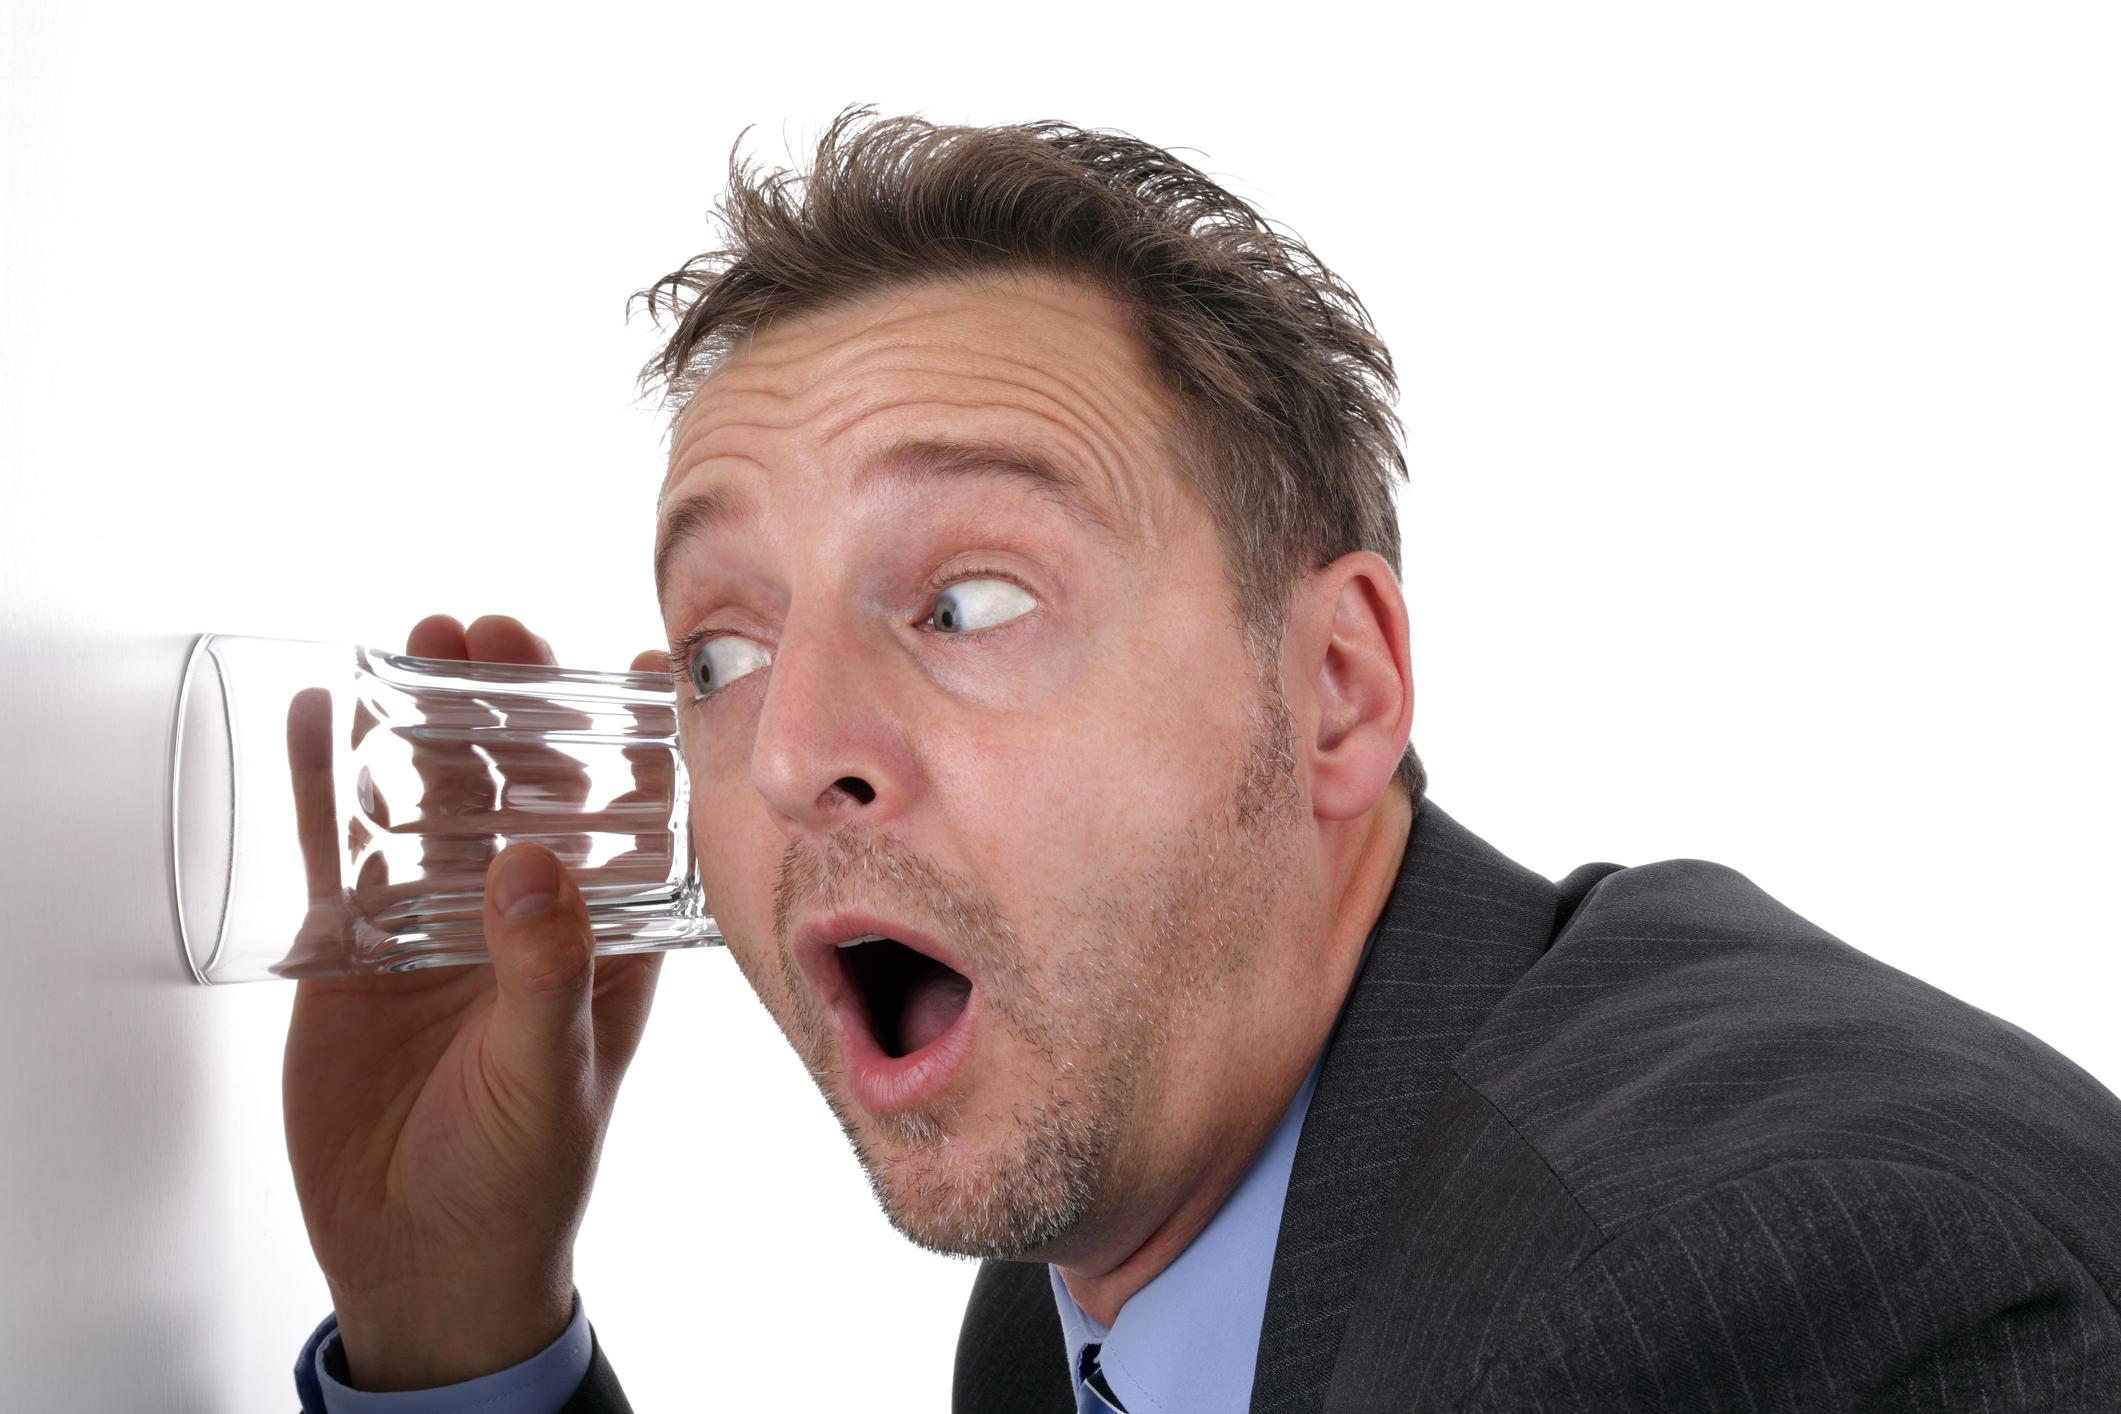 A man listens through a wall using a glass.